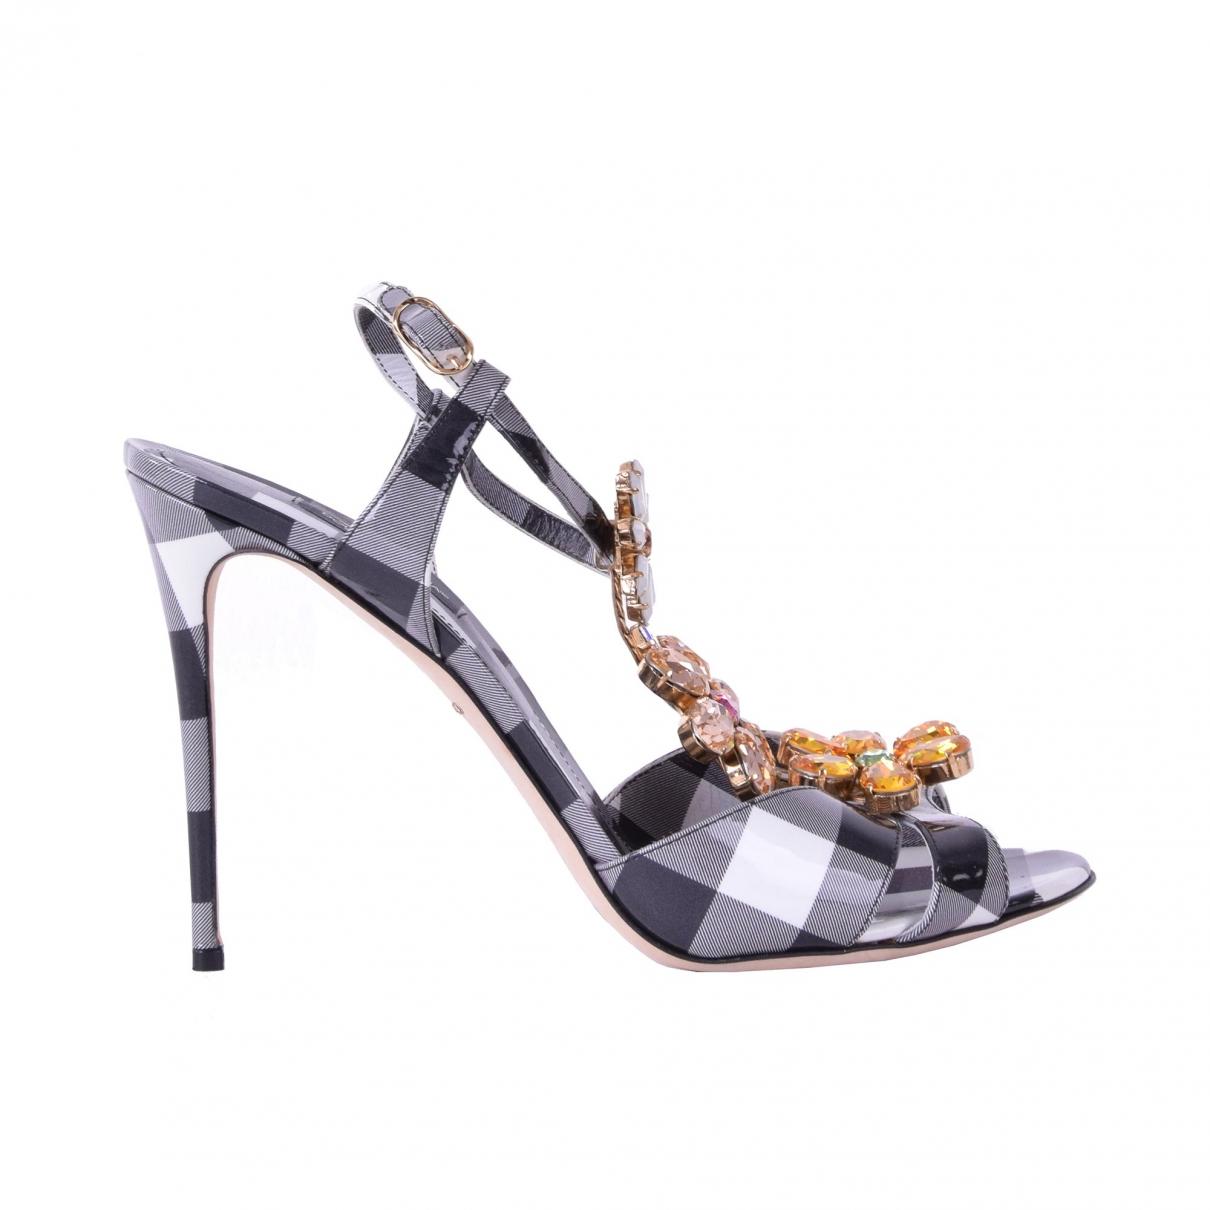 Dolce & Gabbana \N Black Leather Sandals for Women 40.5 EU